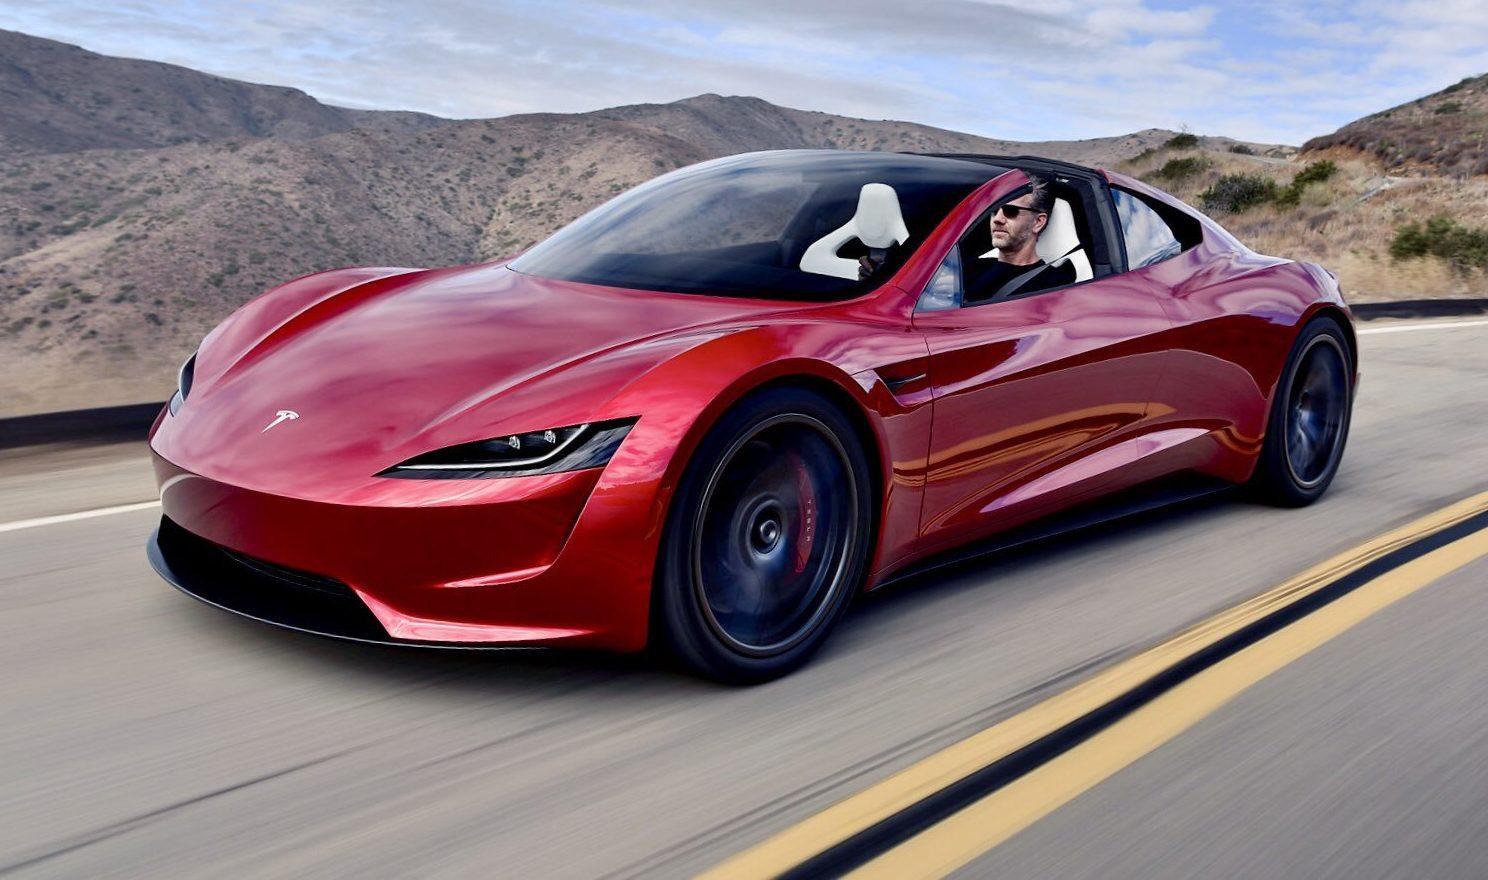 Tesla's Franz von Holzhausen joins list of Most Creative People in Business